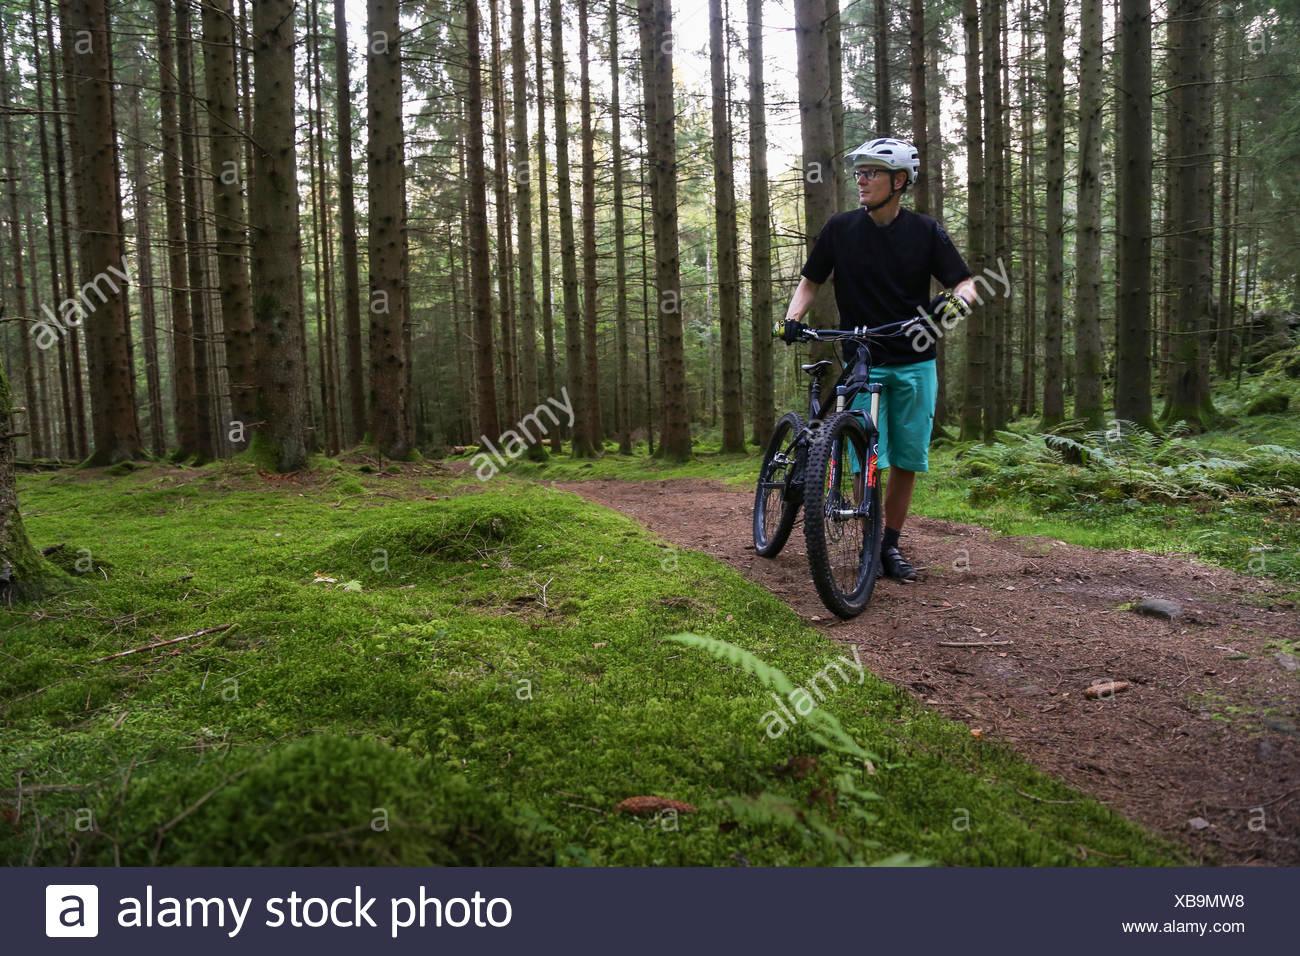 La Suède, vastergotland, lerum, mature man with bicycle in forest Photo Stock